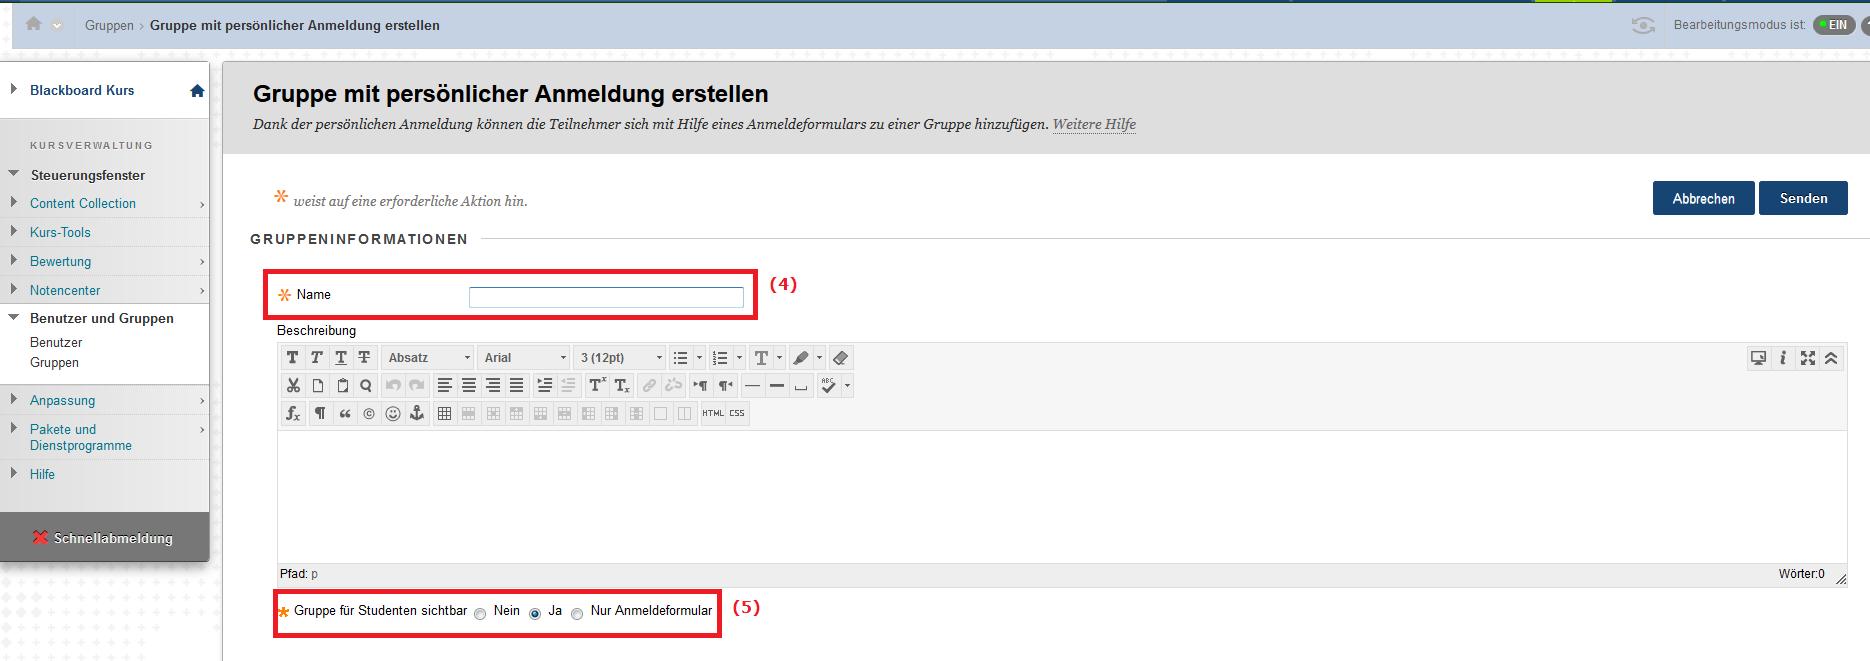 Confluence mobil wikis der freien universität berlin.